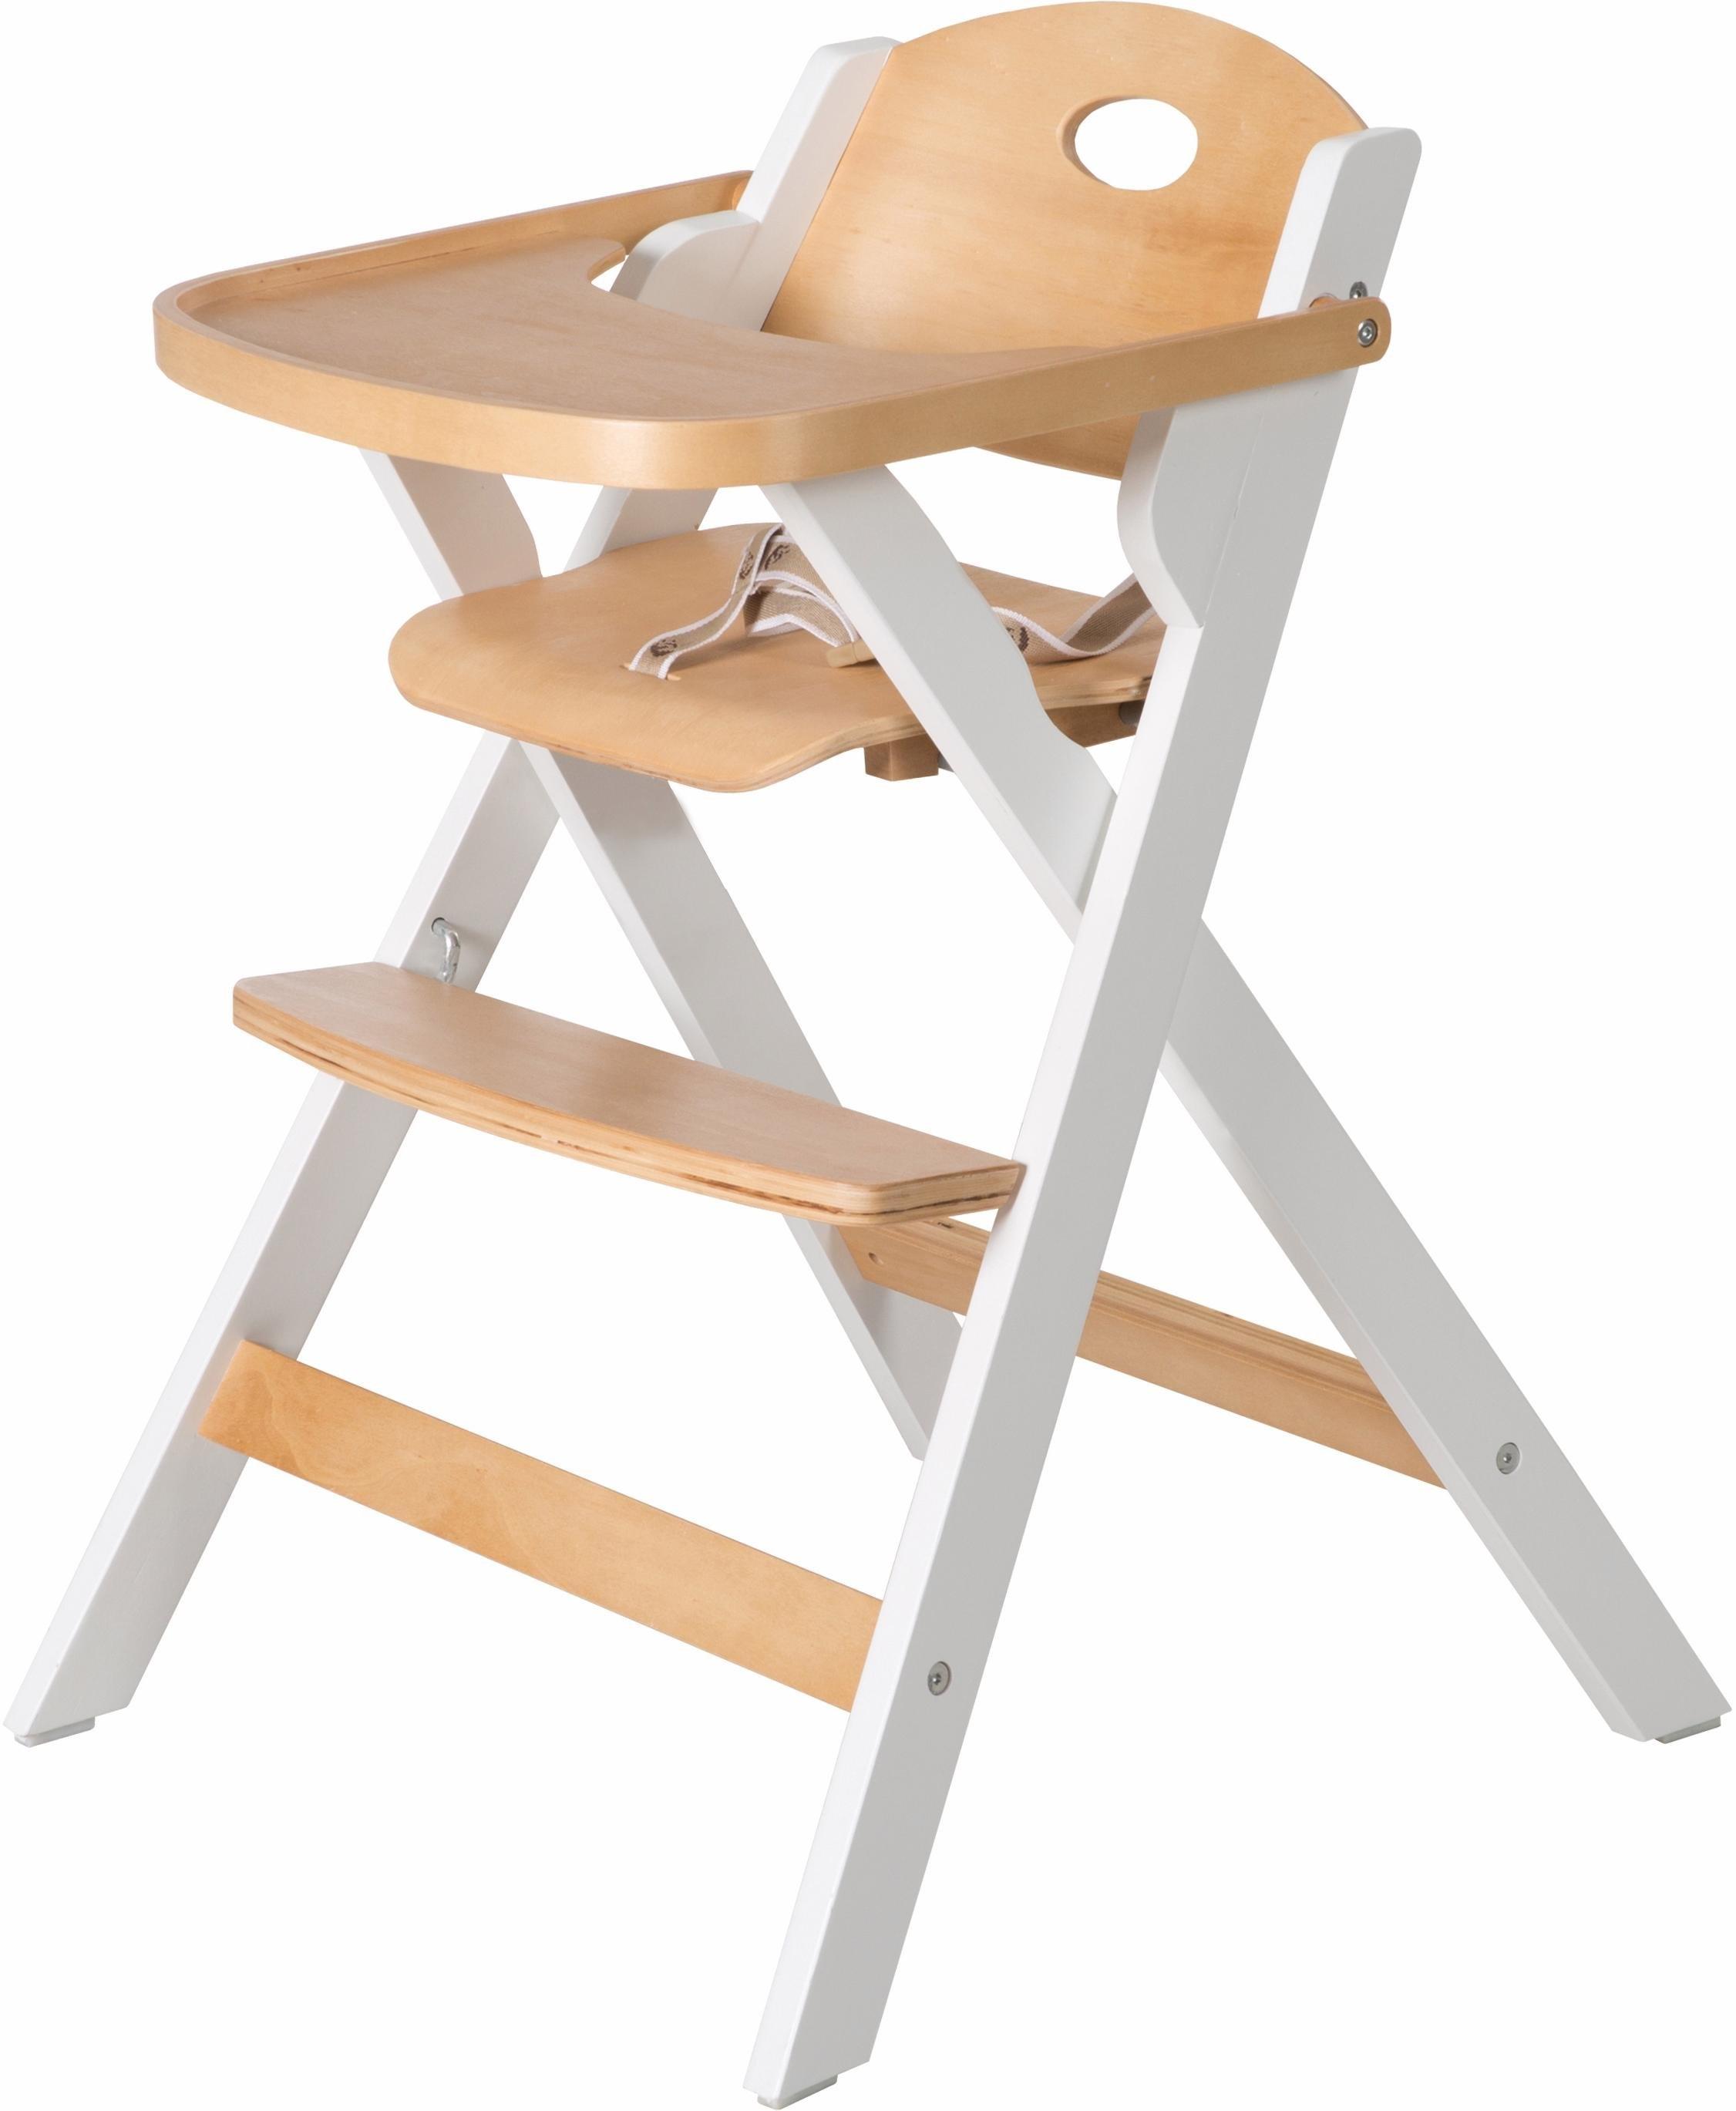 Houten Inklapbare Kinderstoel.Roba Kinderstoel Inklapbaar Inklapbare Kinderstoel Koop Je Bij